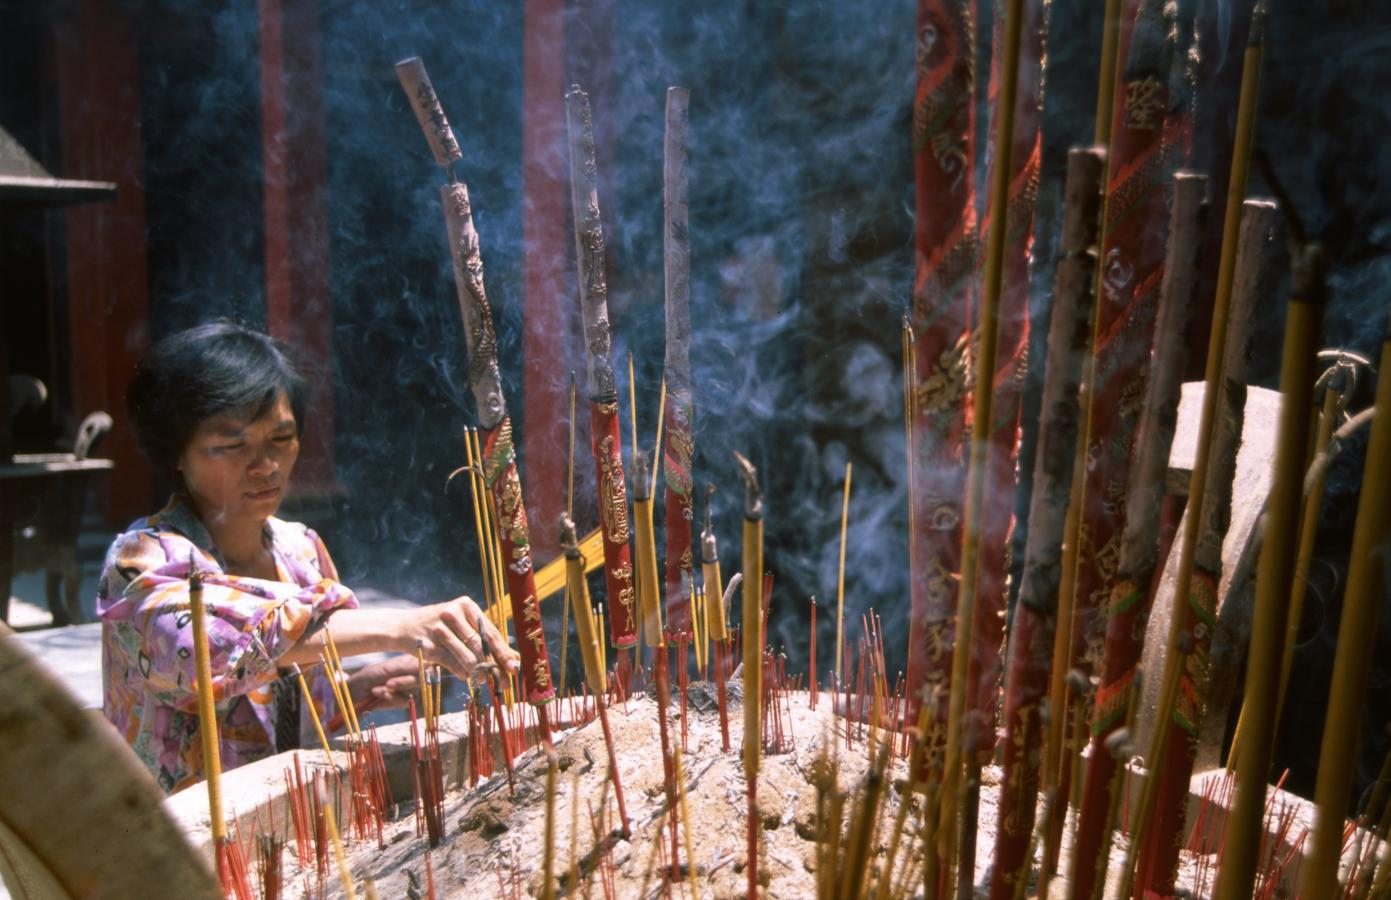 praying-in-a-temple-ho-chi-minh-city-(saigon)